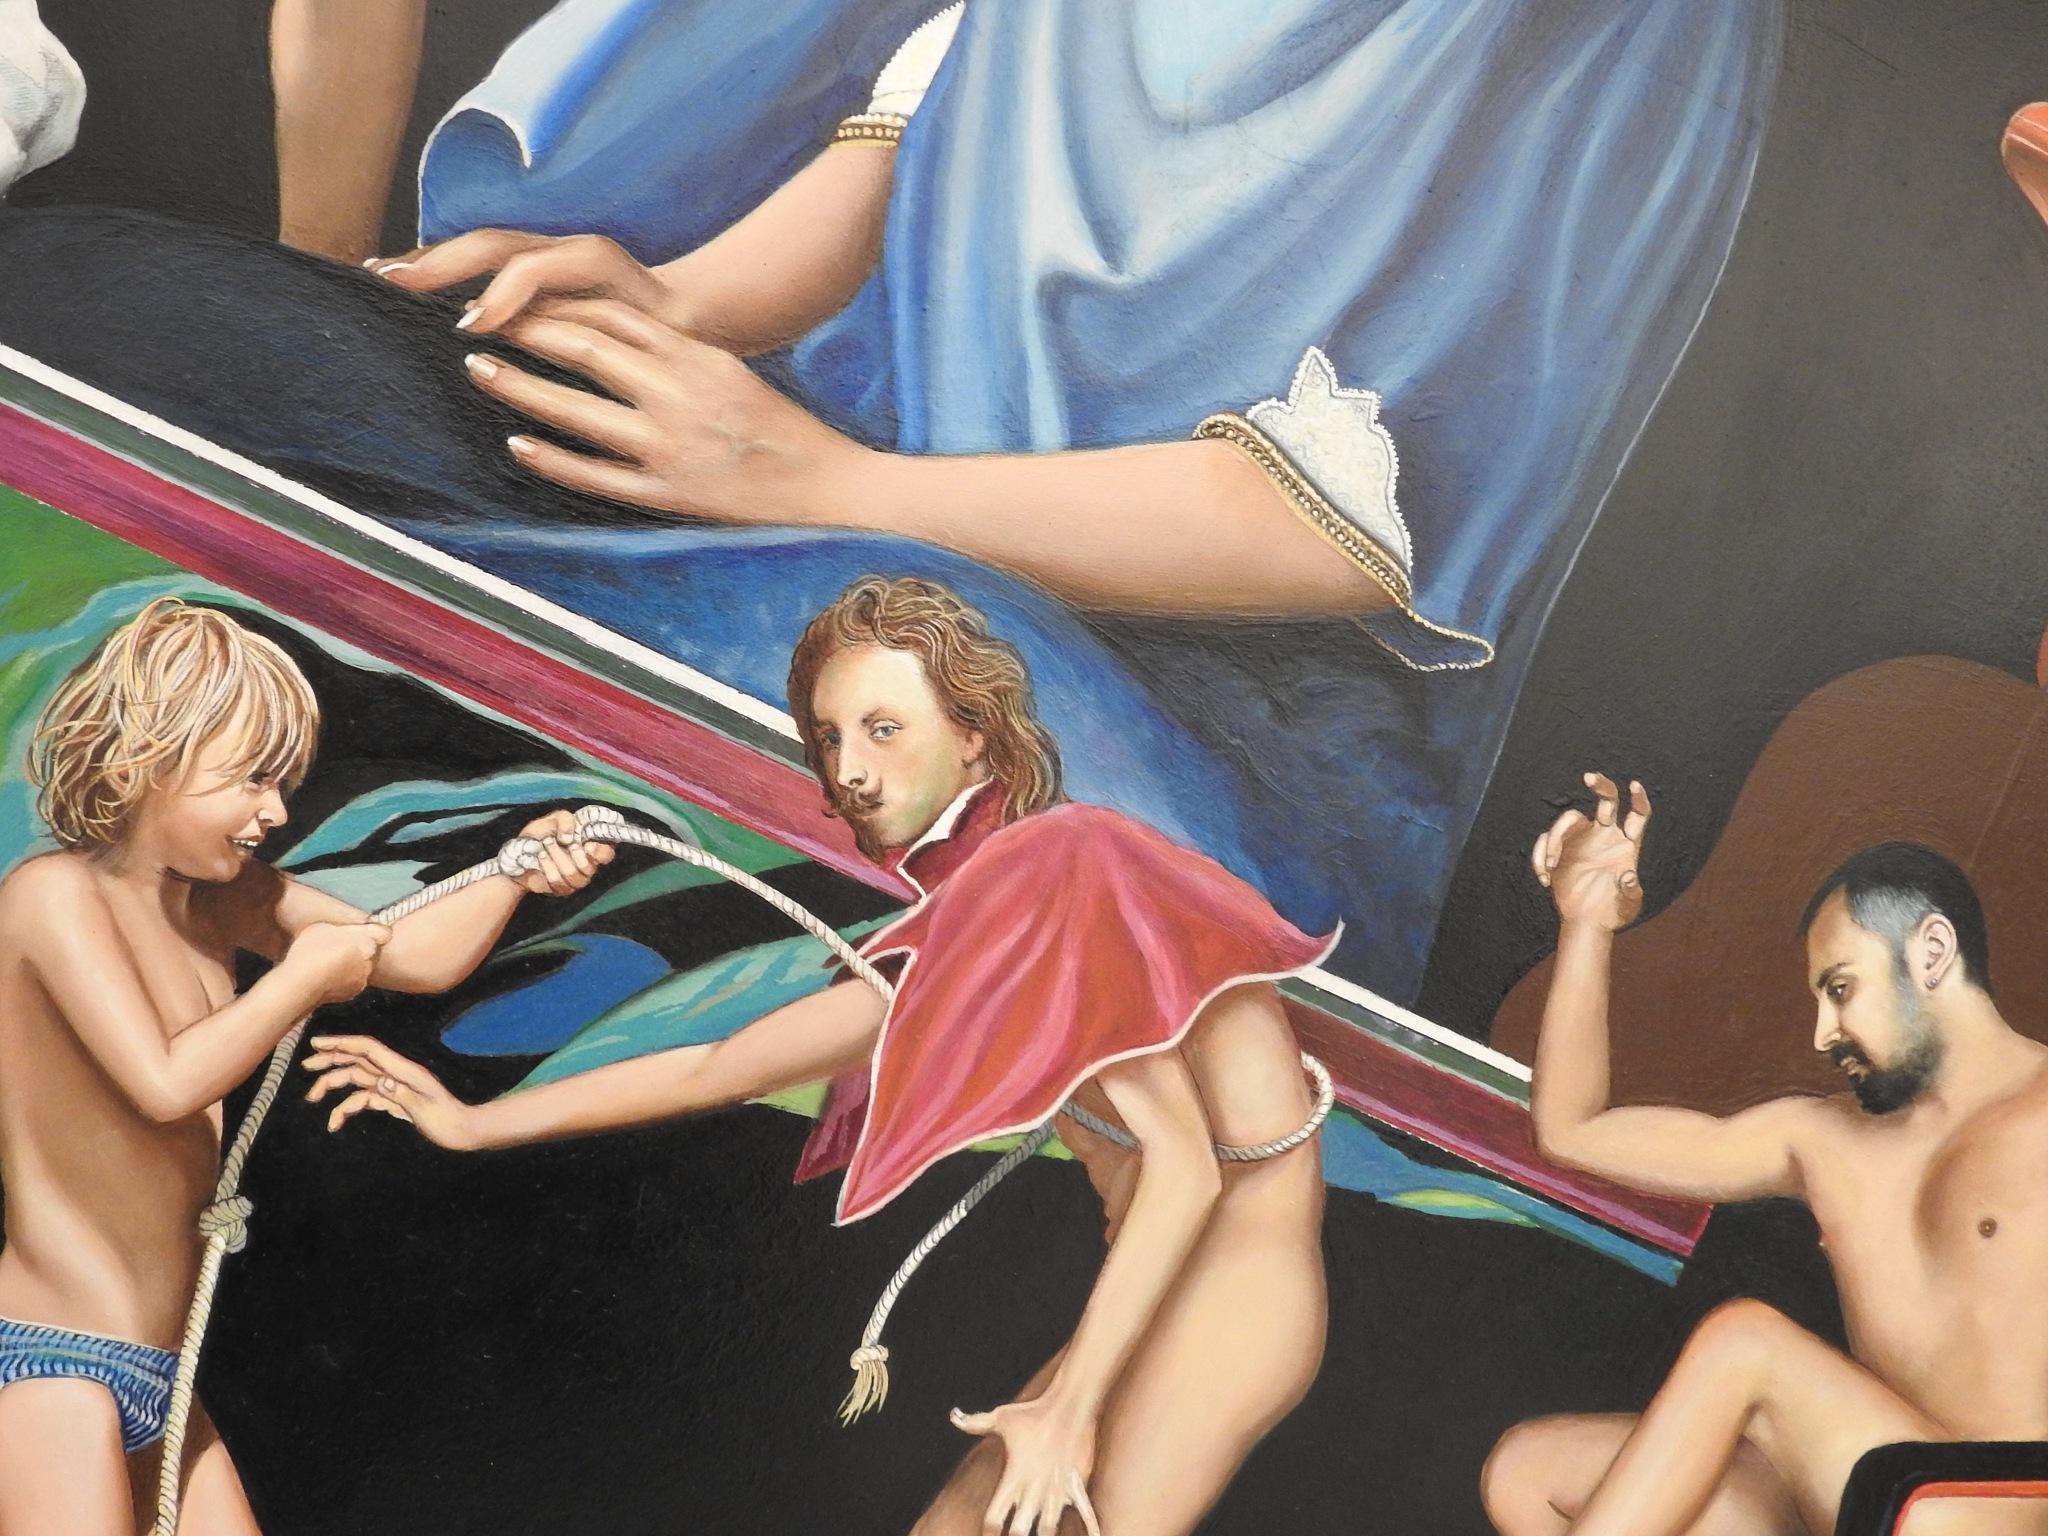 P.A.N. Napoli - Napoli Expo' Art Polis - Mario Gianquitto - Afrodite - 02 by Arnaldo De Lisio